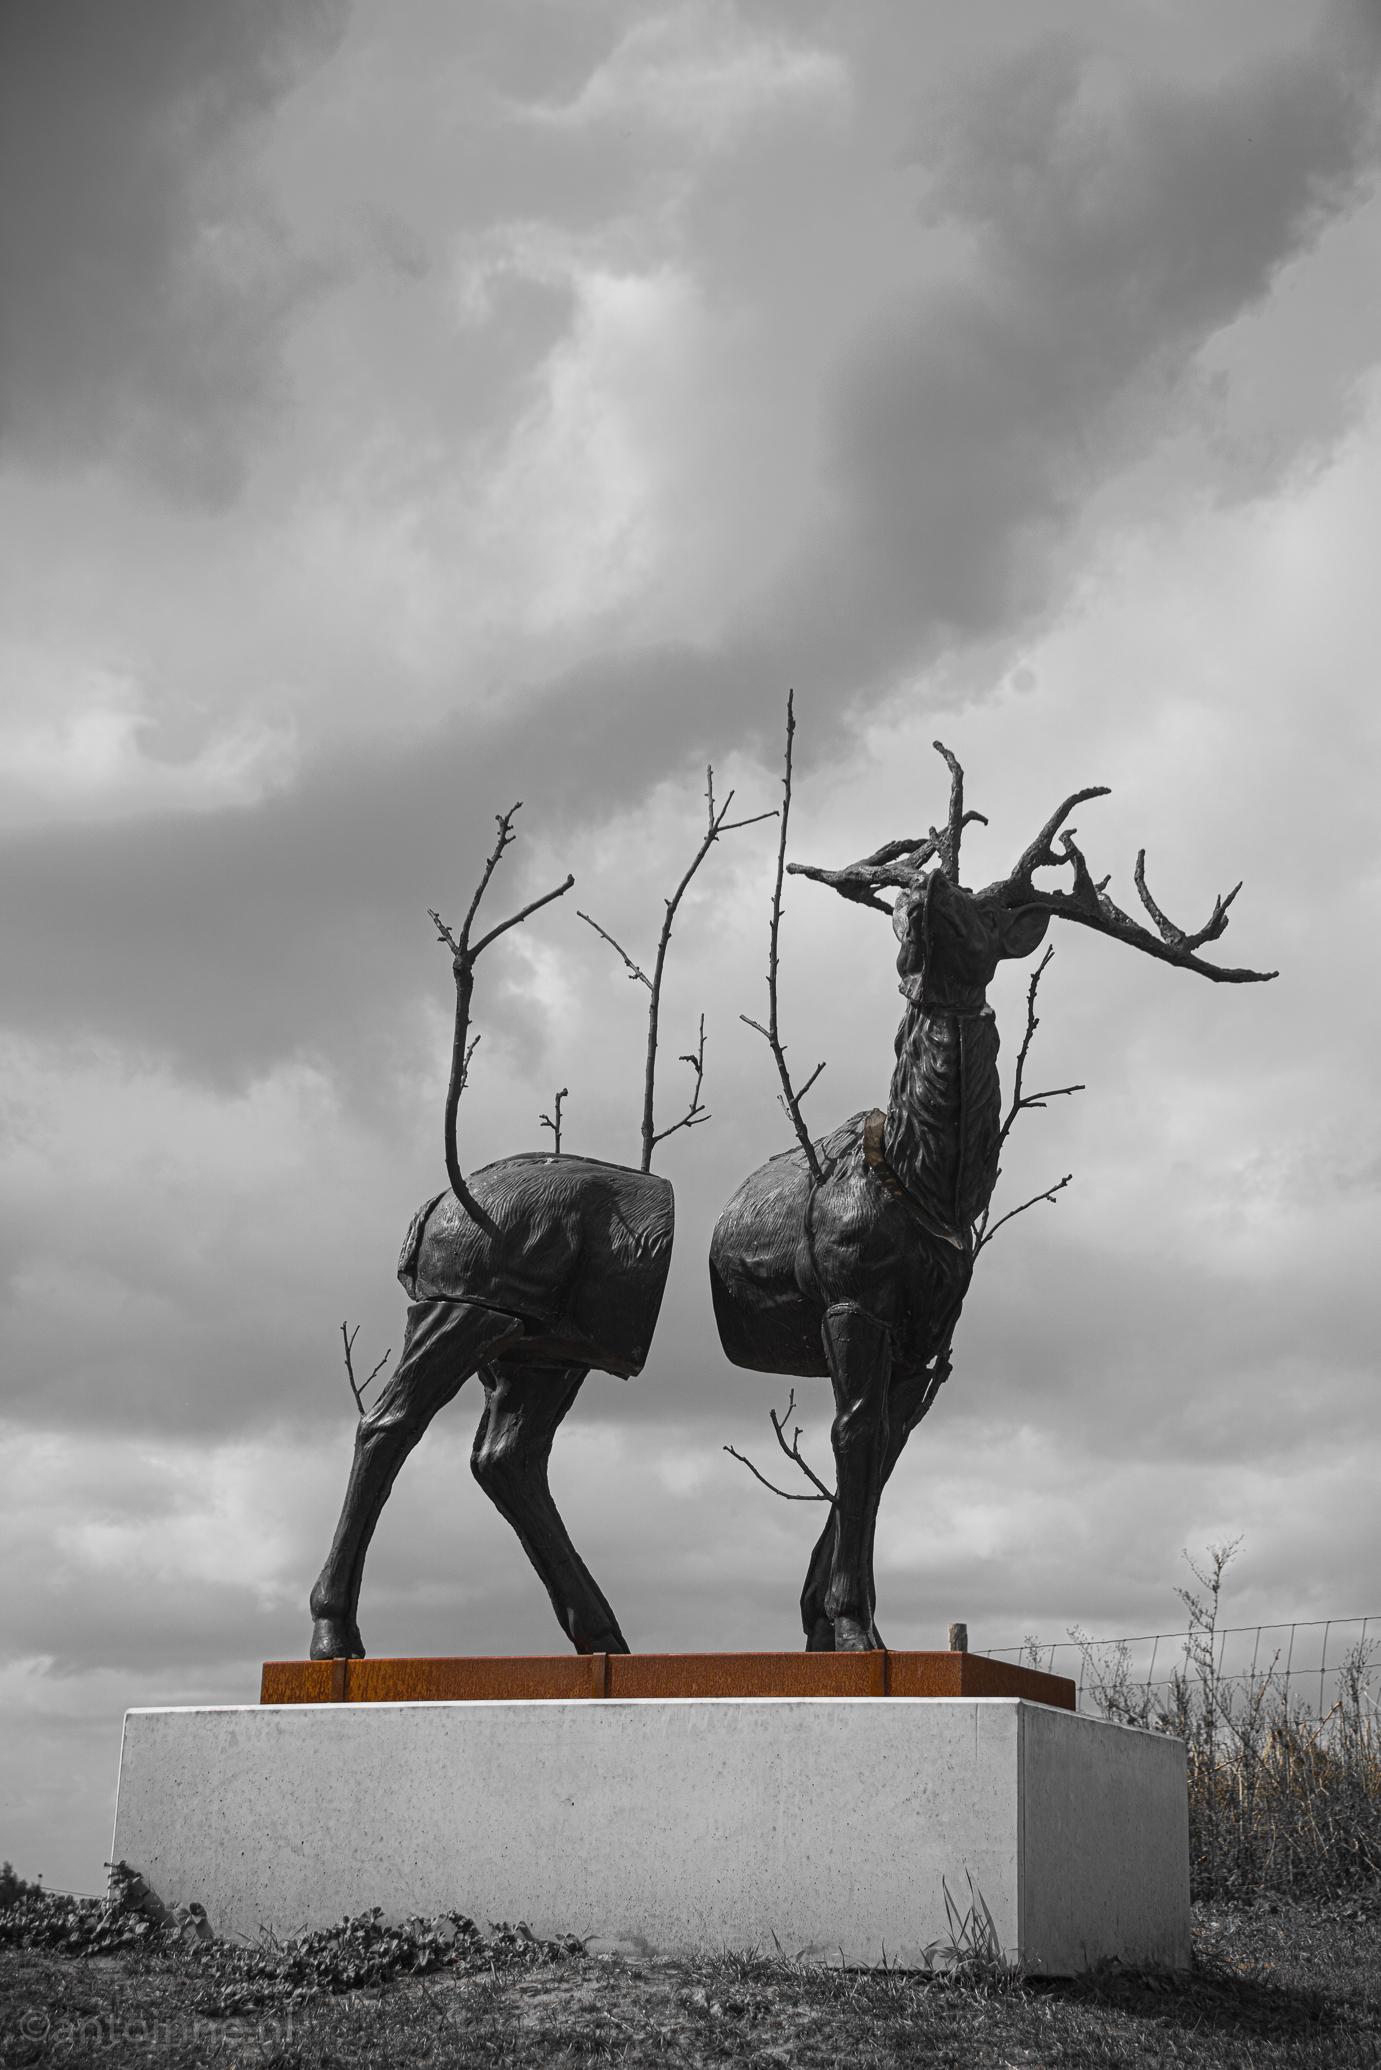 Monument for Cervus Vitalis #2 (Malus Sylvestris) - Beaufort aan Zee 2018, Stief DeSmet